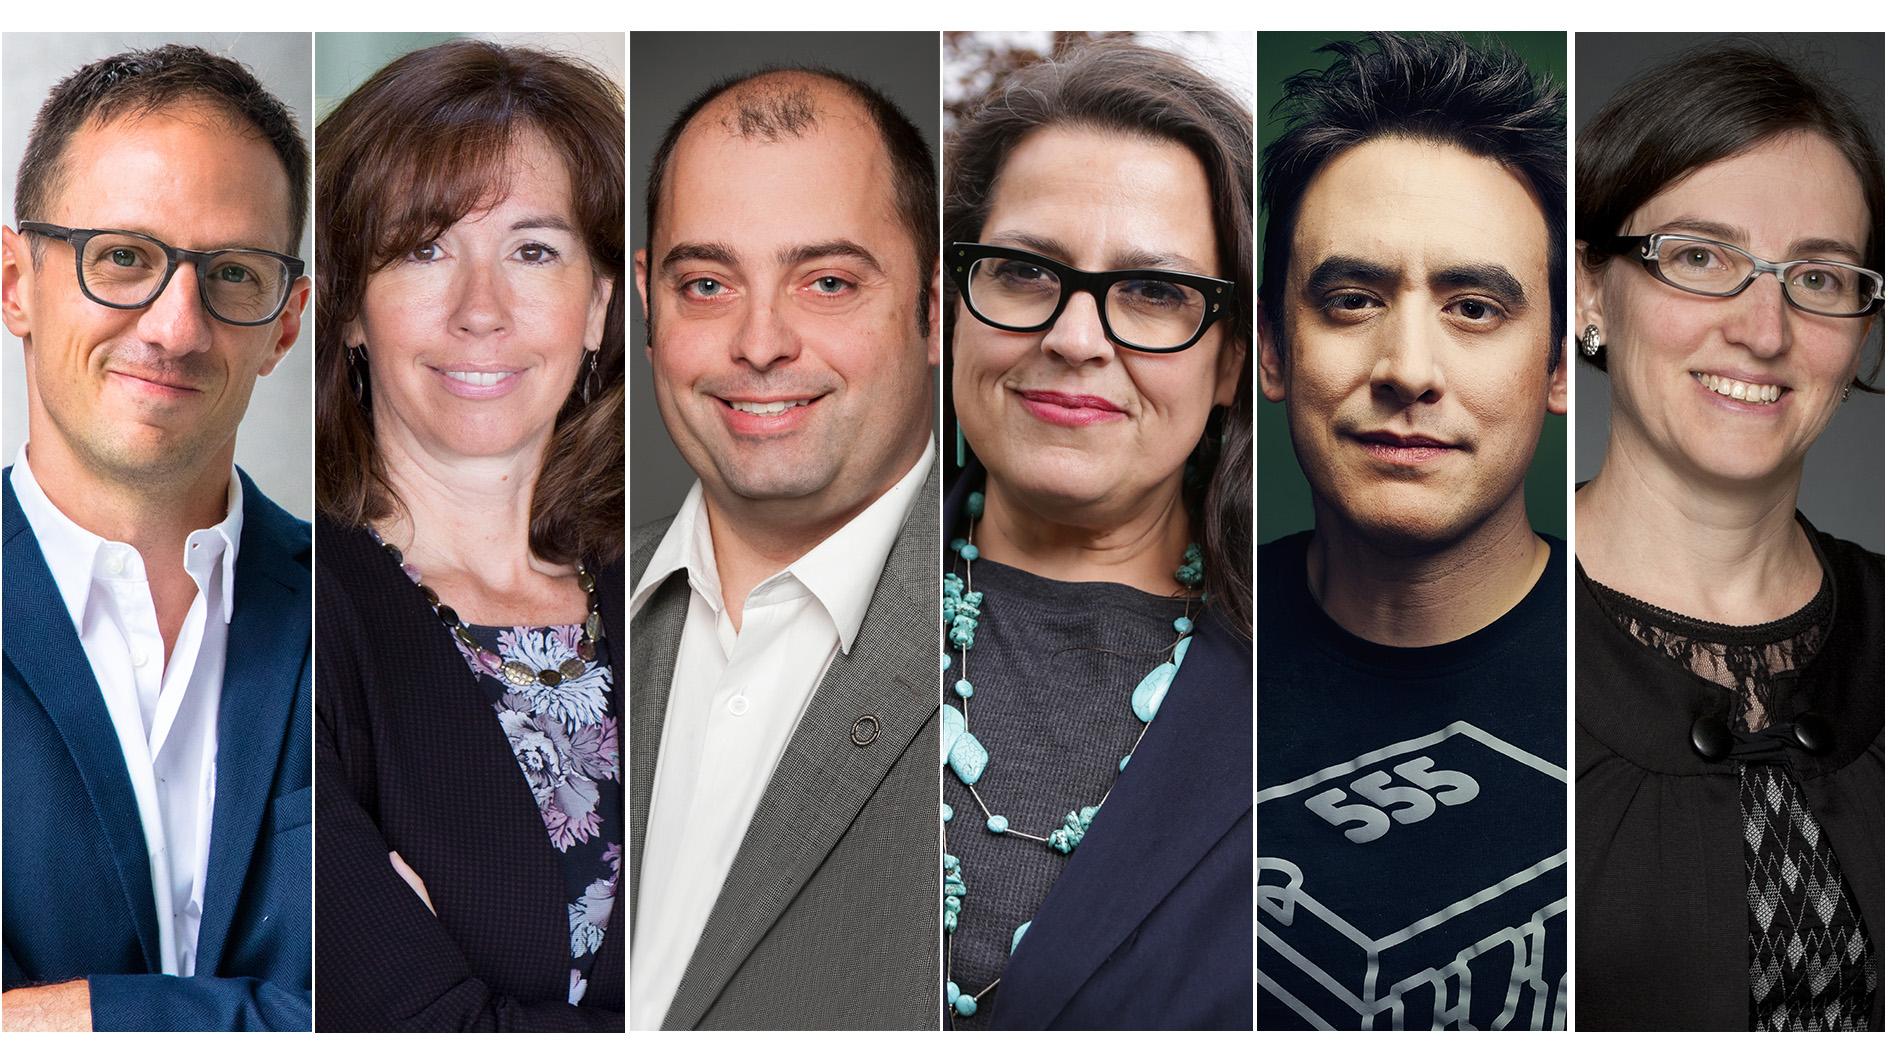 Pascal Audet, Nathalie Chalifour, Marc-André Langlois, Lindsey Lindberg, Andrew Pelling et Marie-Ève Sylvestre